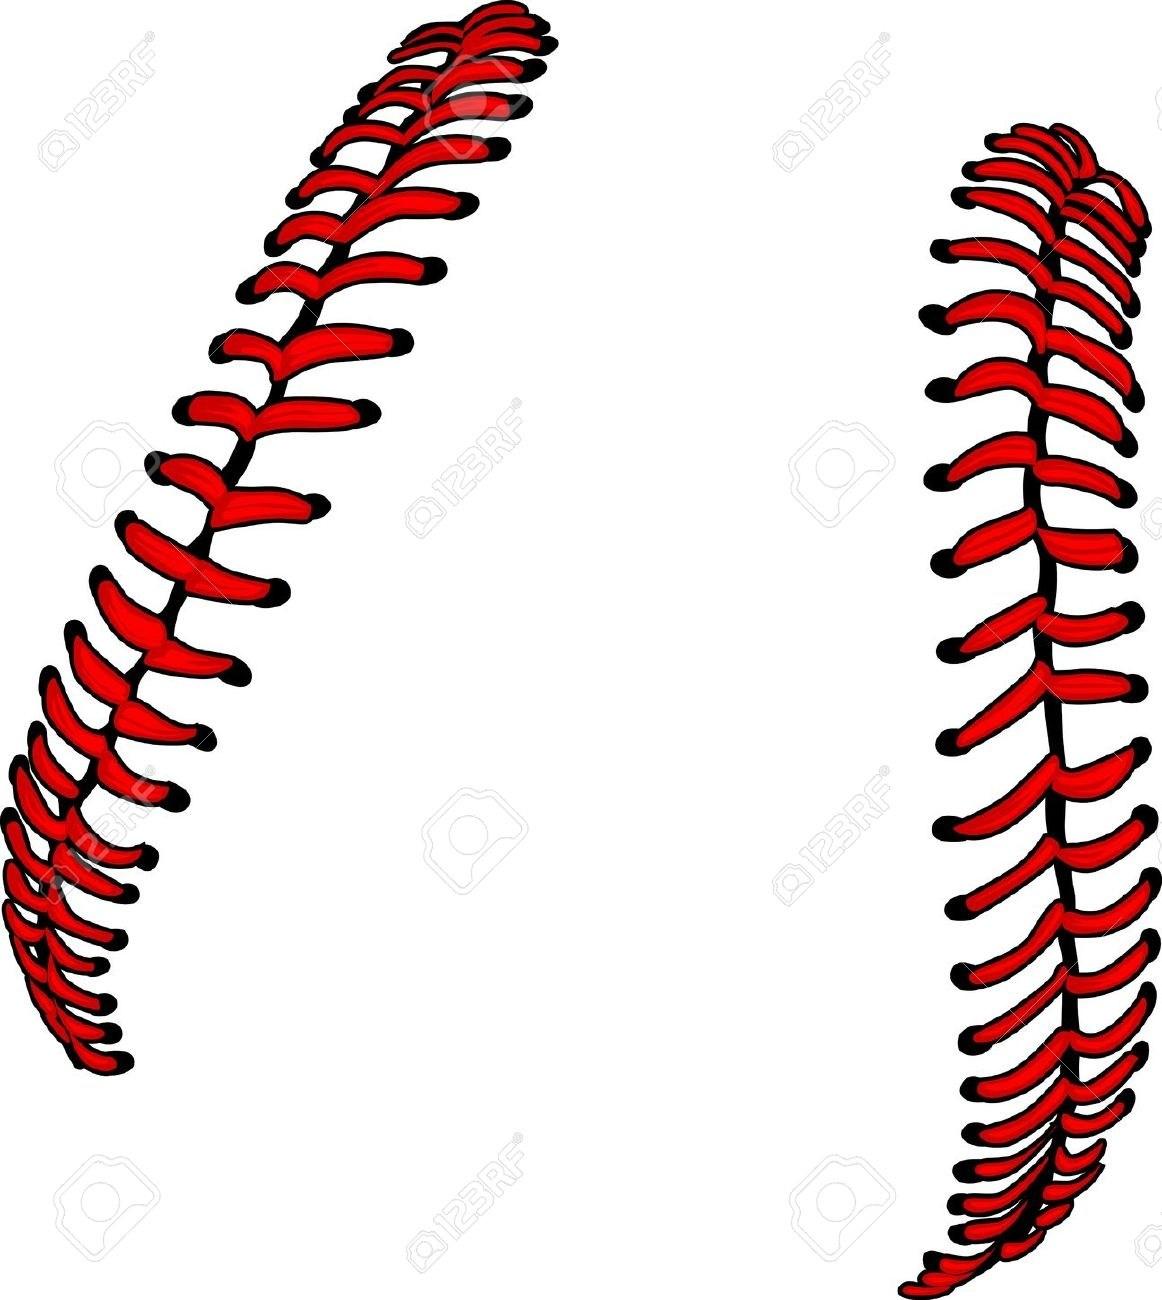 Baseball thread clipart 6 » Clipart Portal.